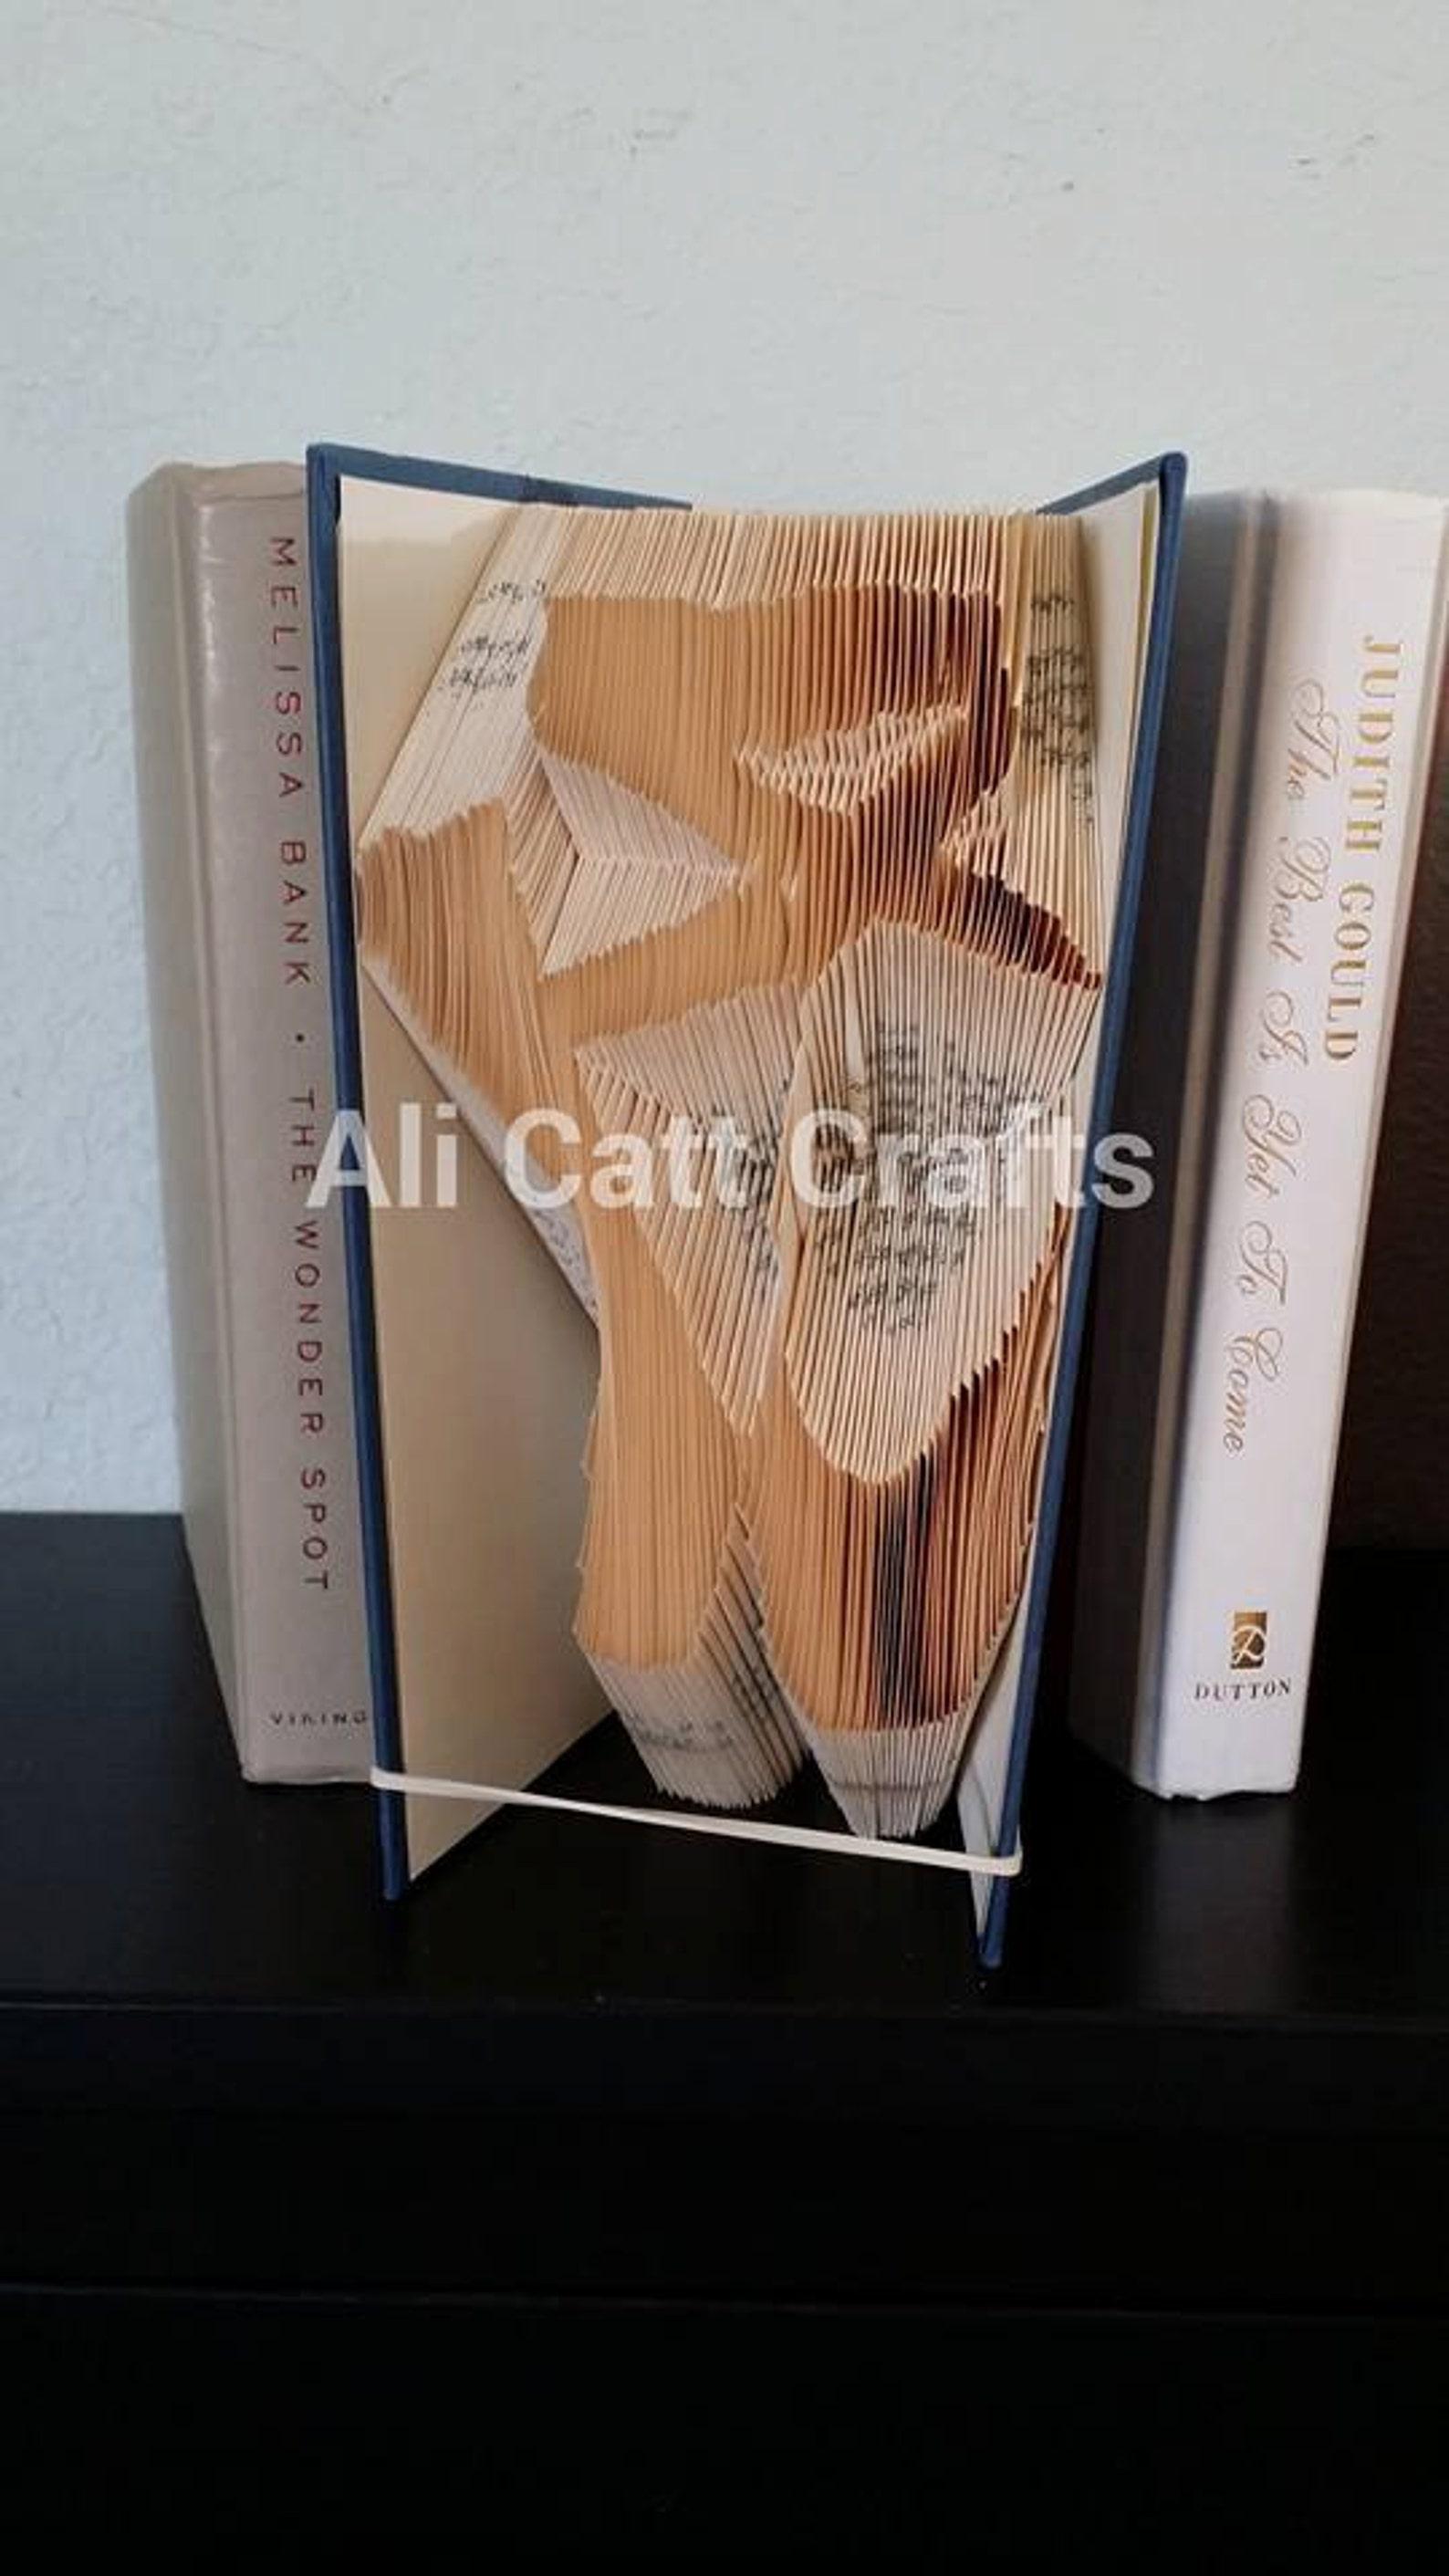 143 - ballet shoes - book folding pattern